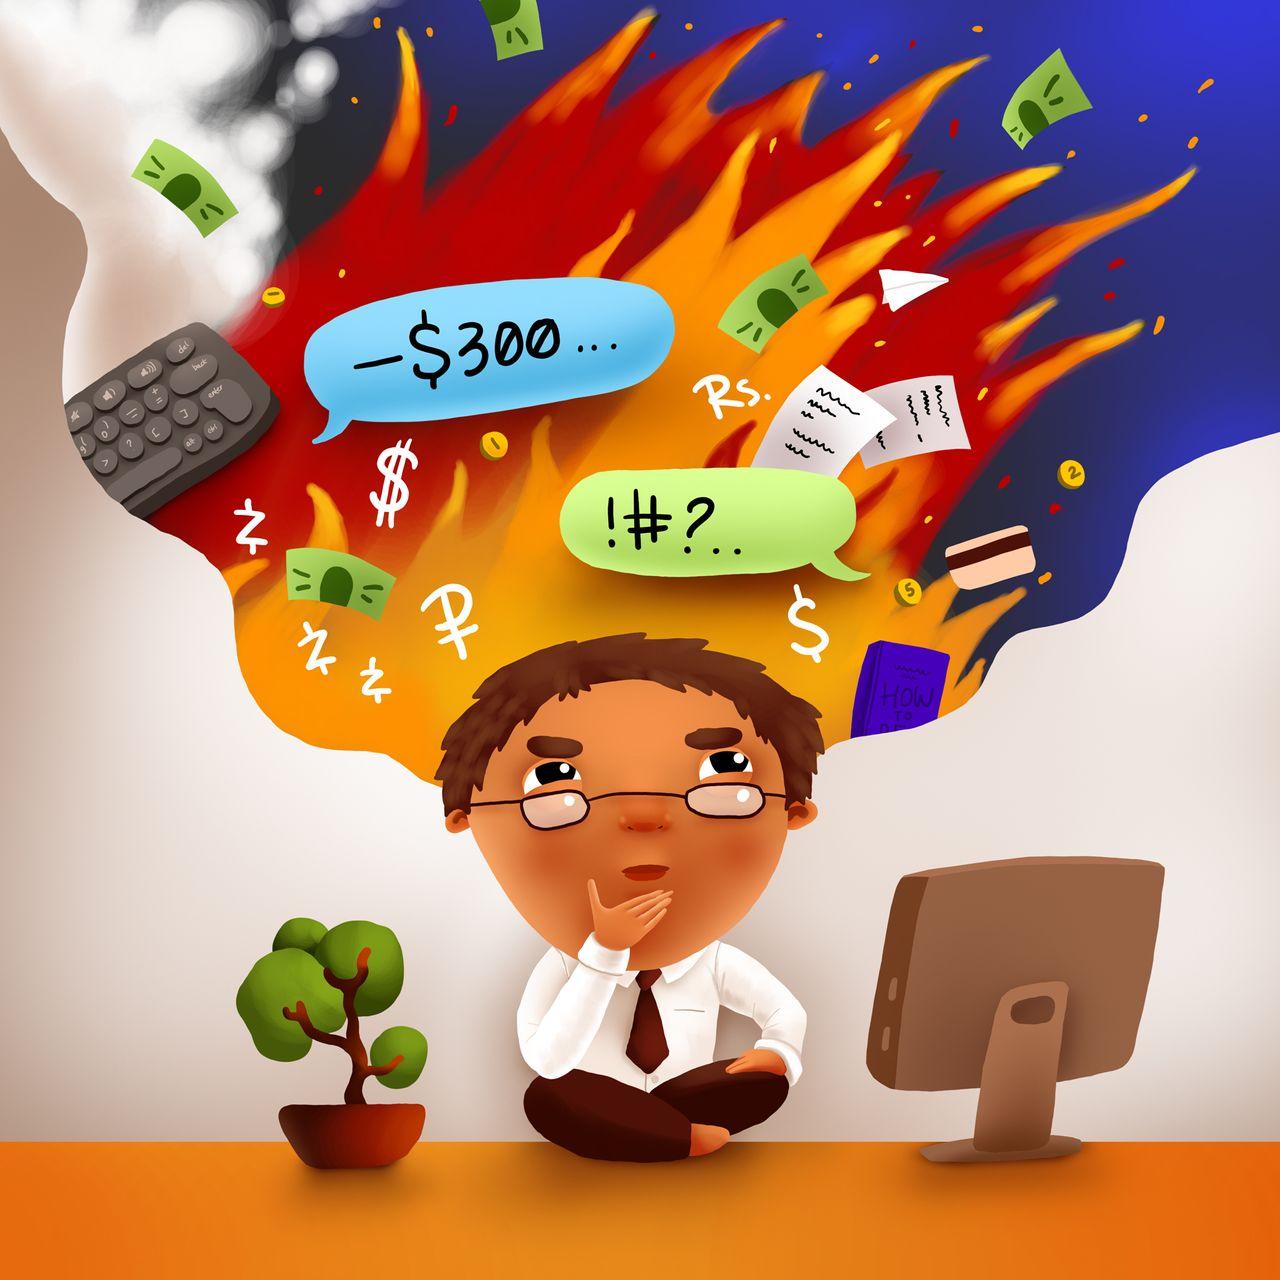 man_thinking2.jpg